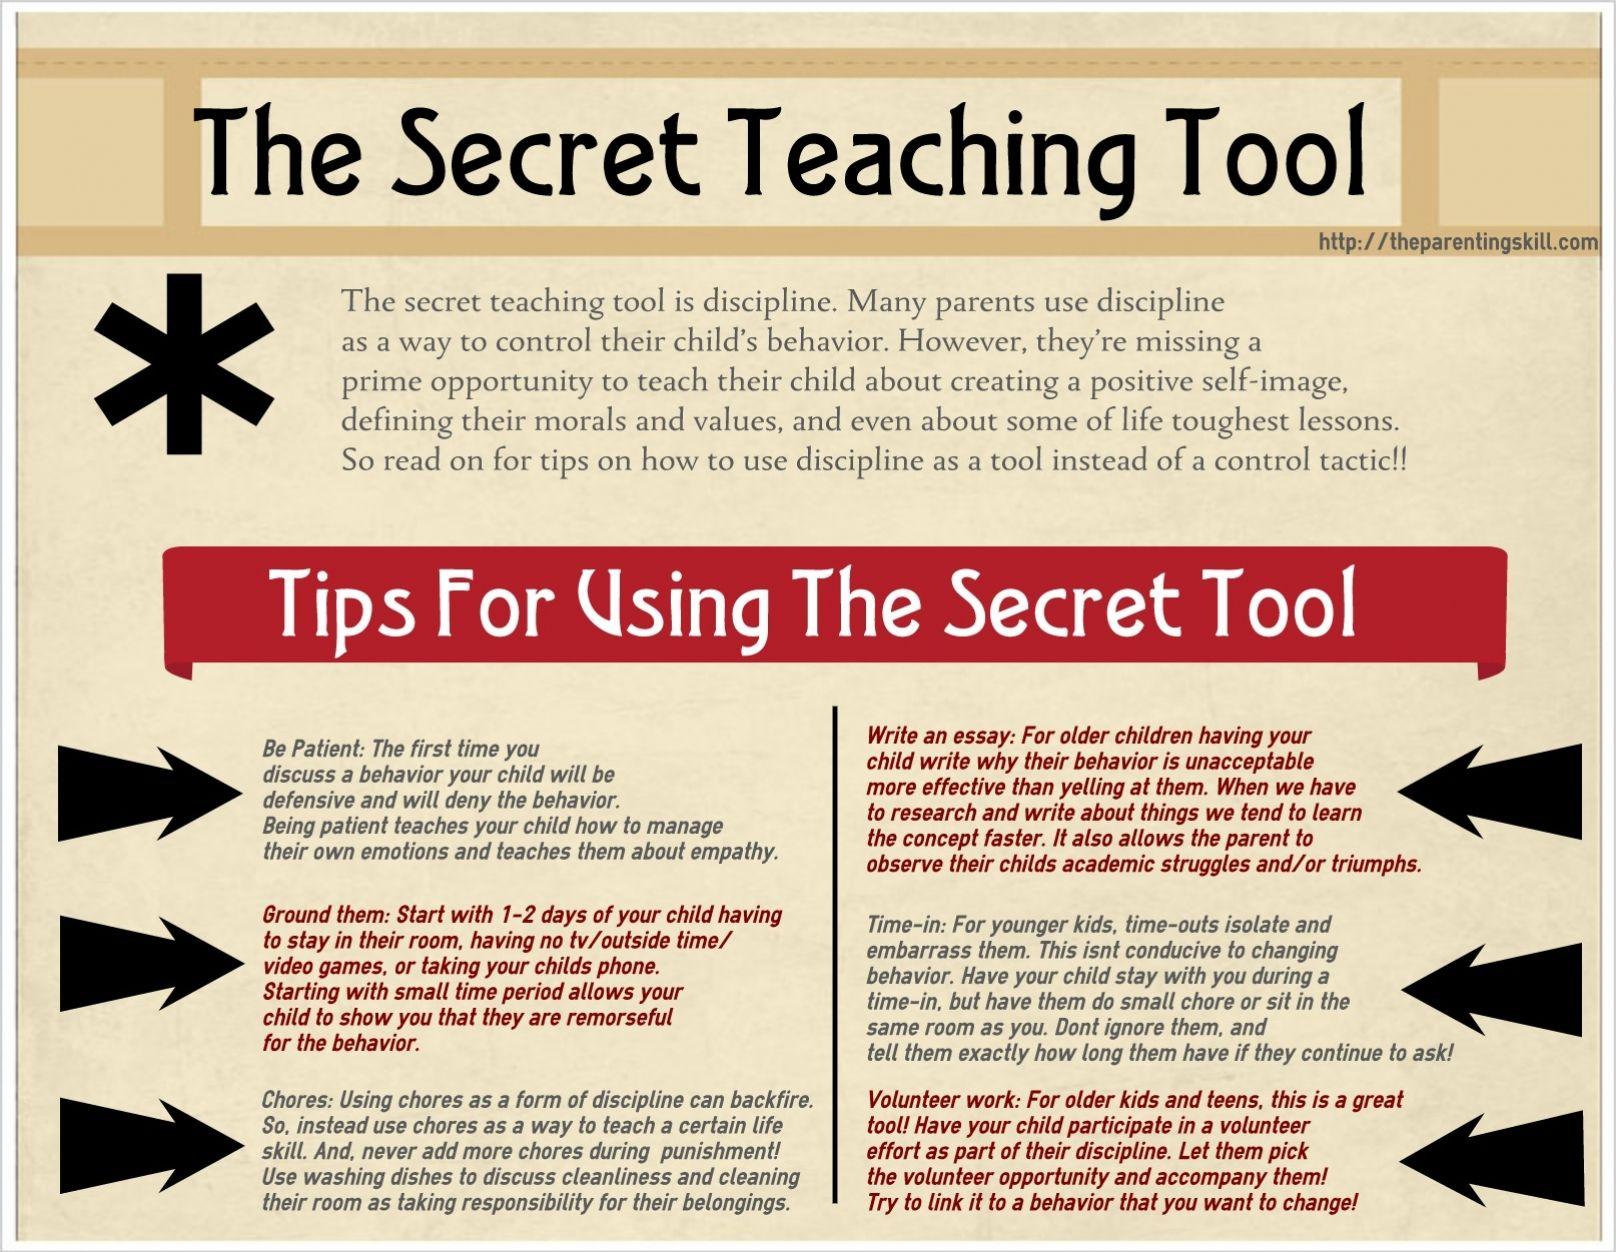 The Secret Teaching Tool